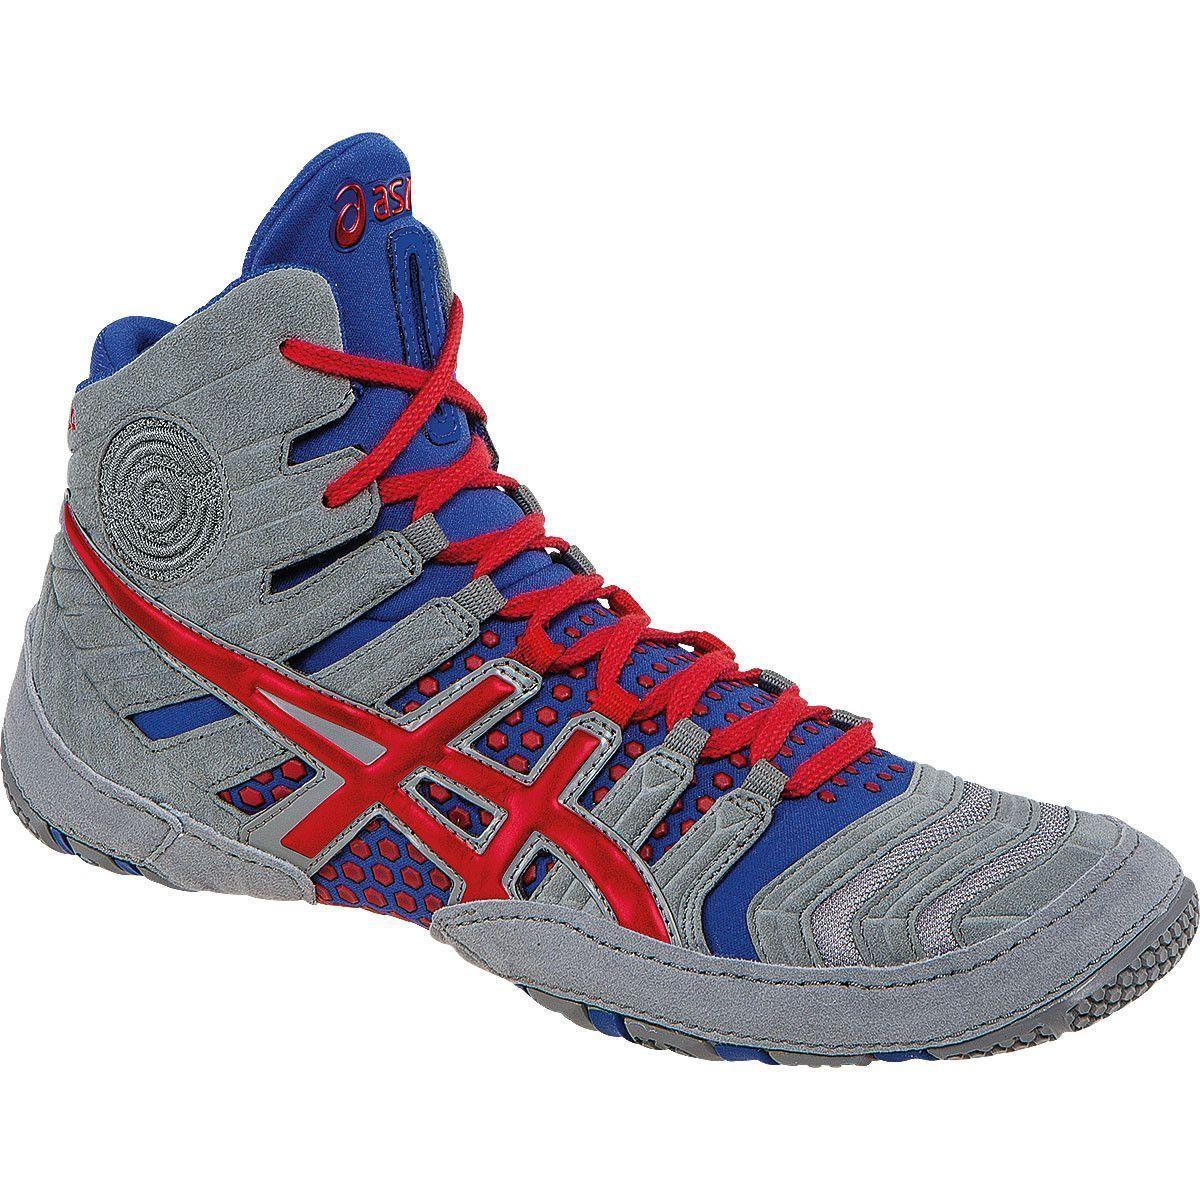 asics dan gable ultimate 1 wrestling shoes